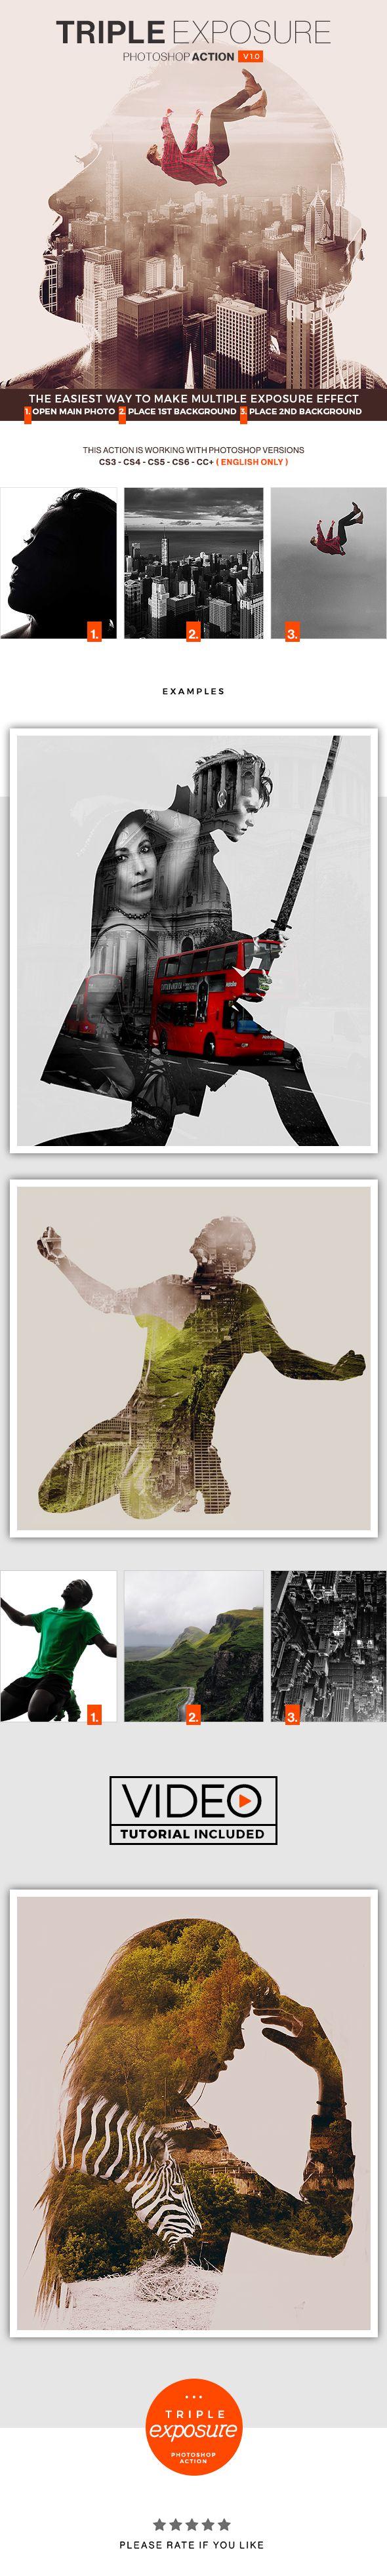 Triple Exposure Photoshop Action — Photoshop ATN #bi #light • Download ➝ https://graphicriver.net/item/triple-exposure-photoshop-action/19446971?ref=pxcr